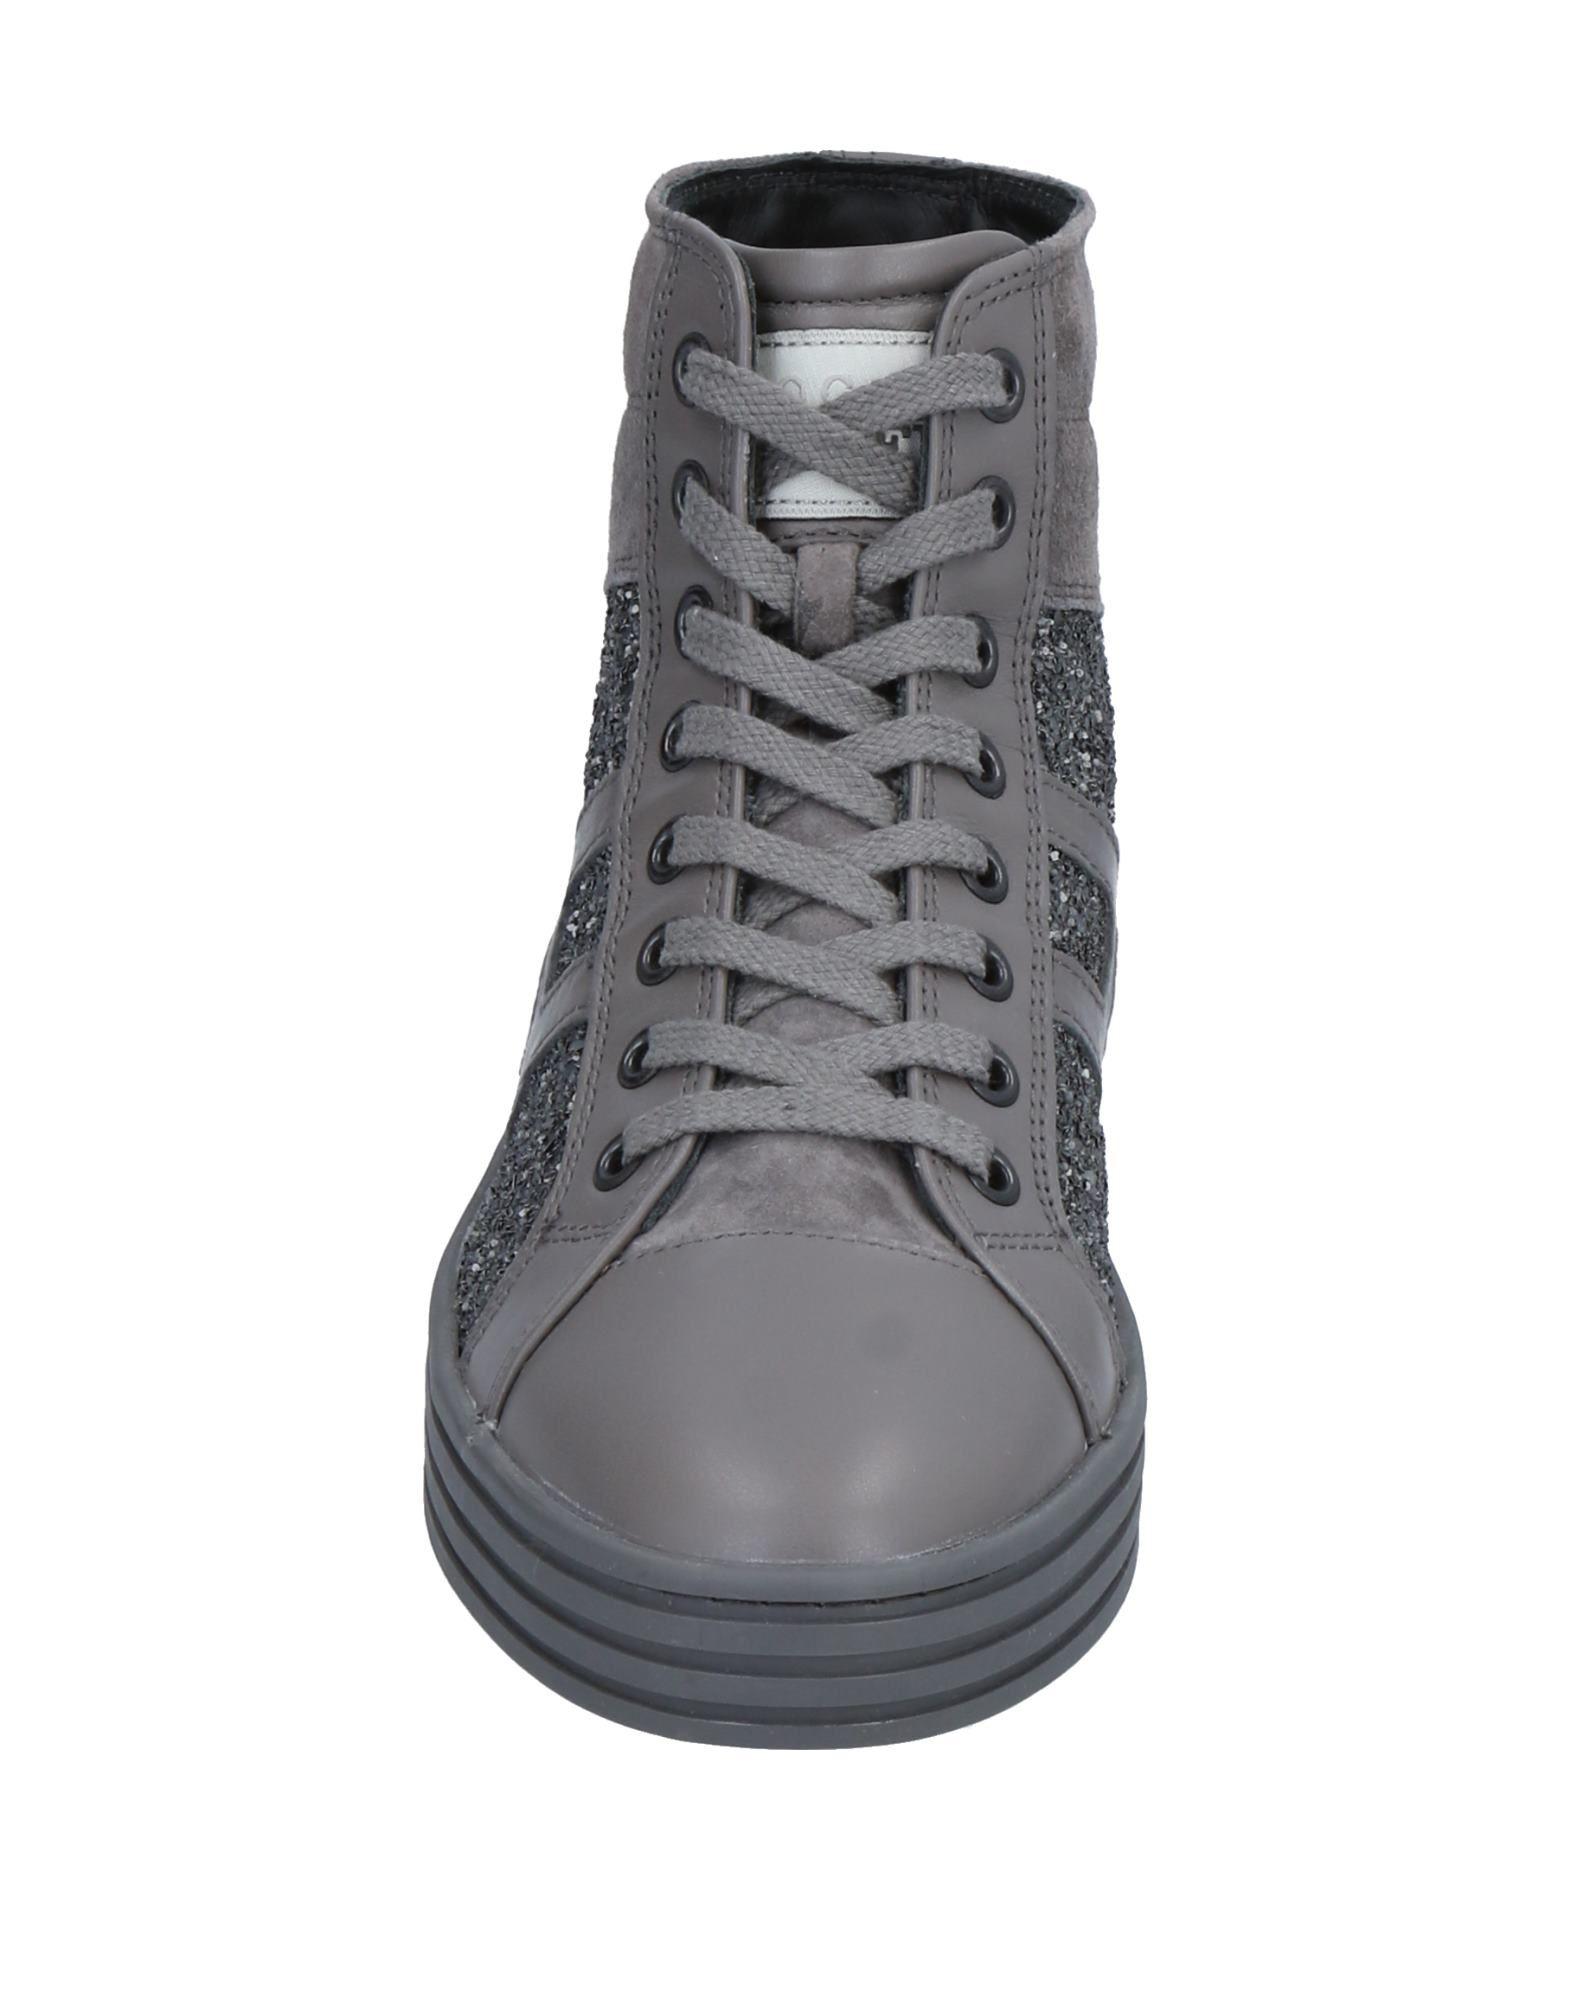 Stilvolle billige Schuhe Damen Hogan Rebel Sneakers Damen Schuhe  11493196AJ efad92